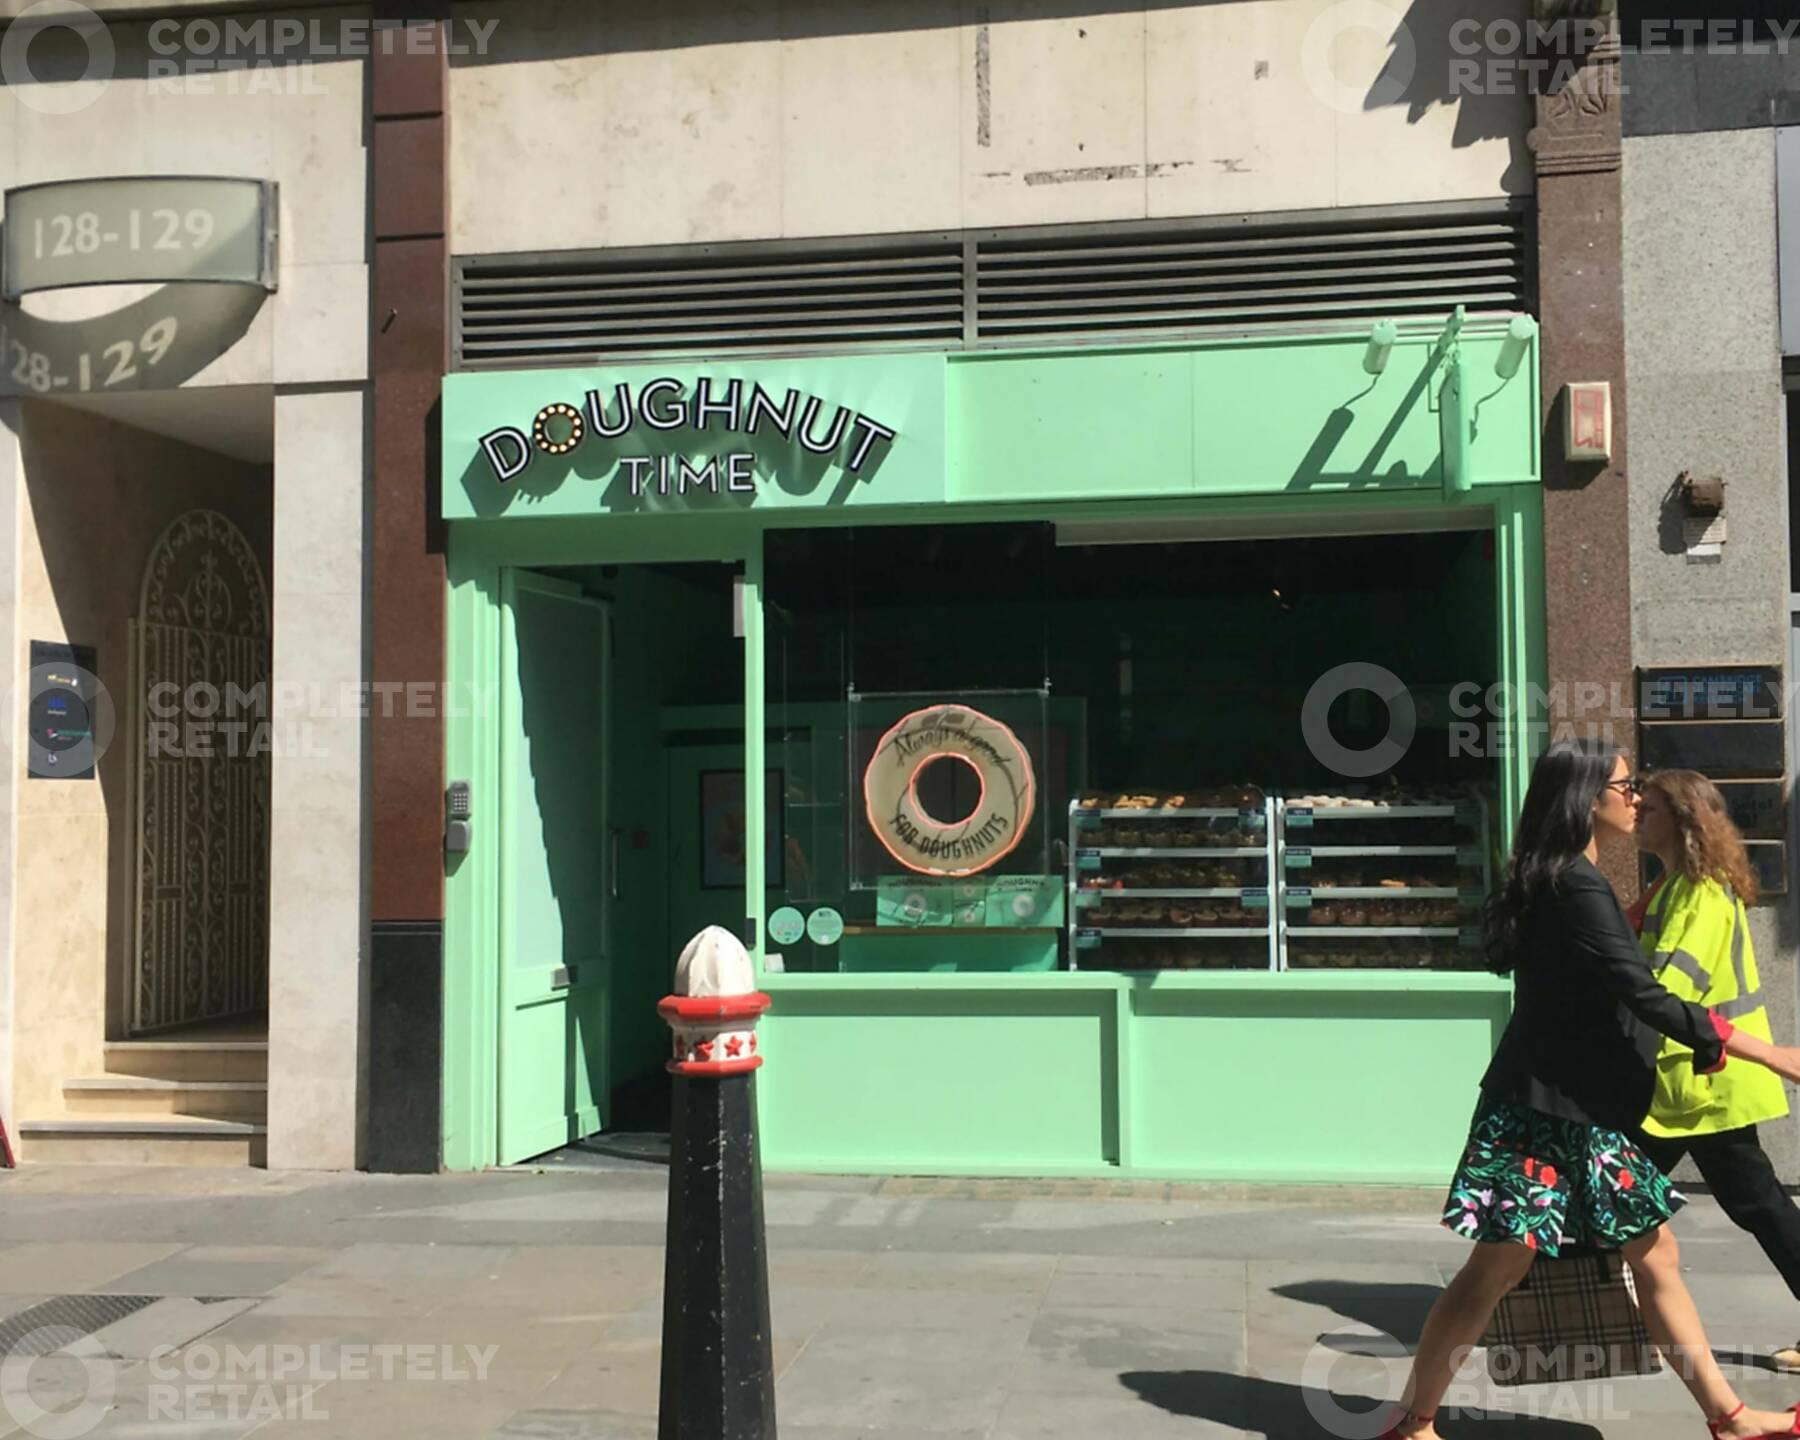 128-129 Cheapside